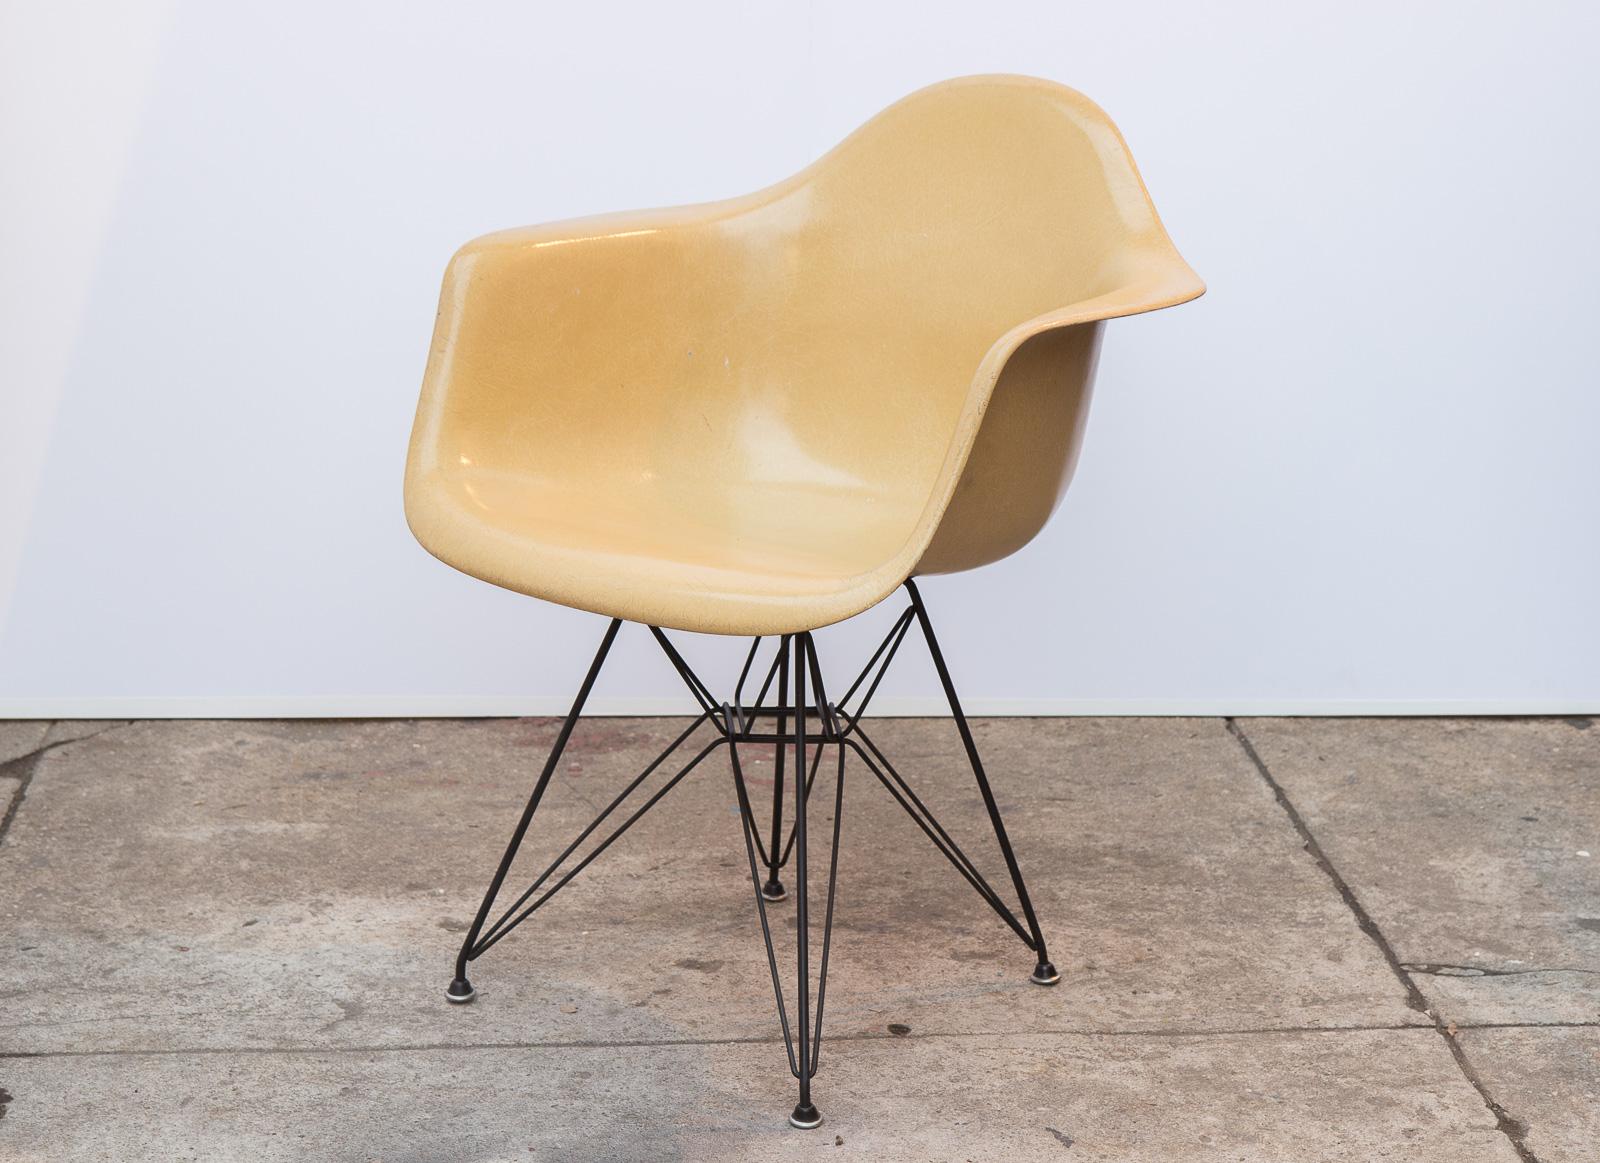 eames arm chair black and white dining chairs butterscotch armchair shell on eiffel base oam open air modern fiberglass shells for herman miller 2 jpg